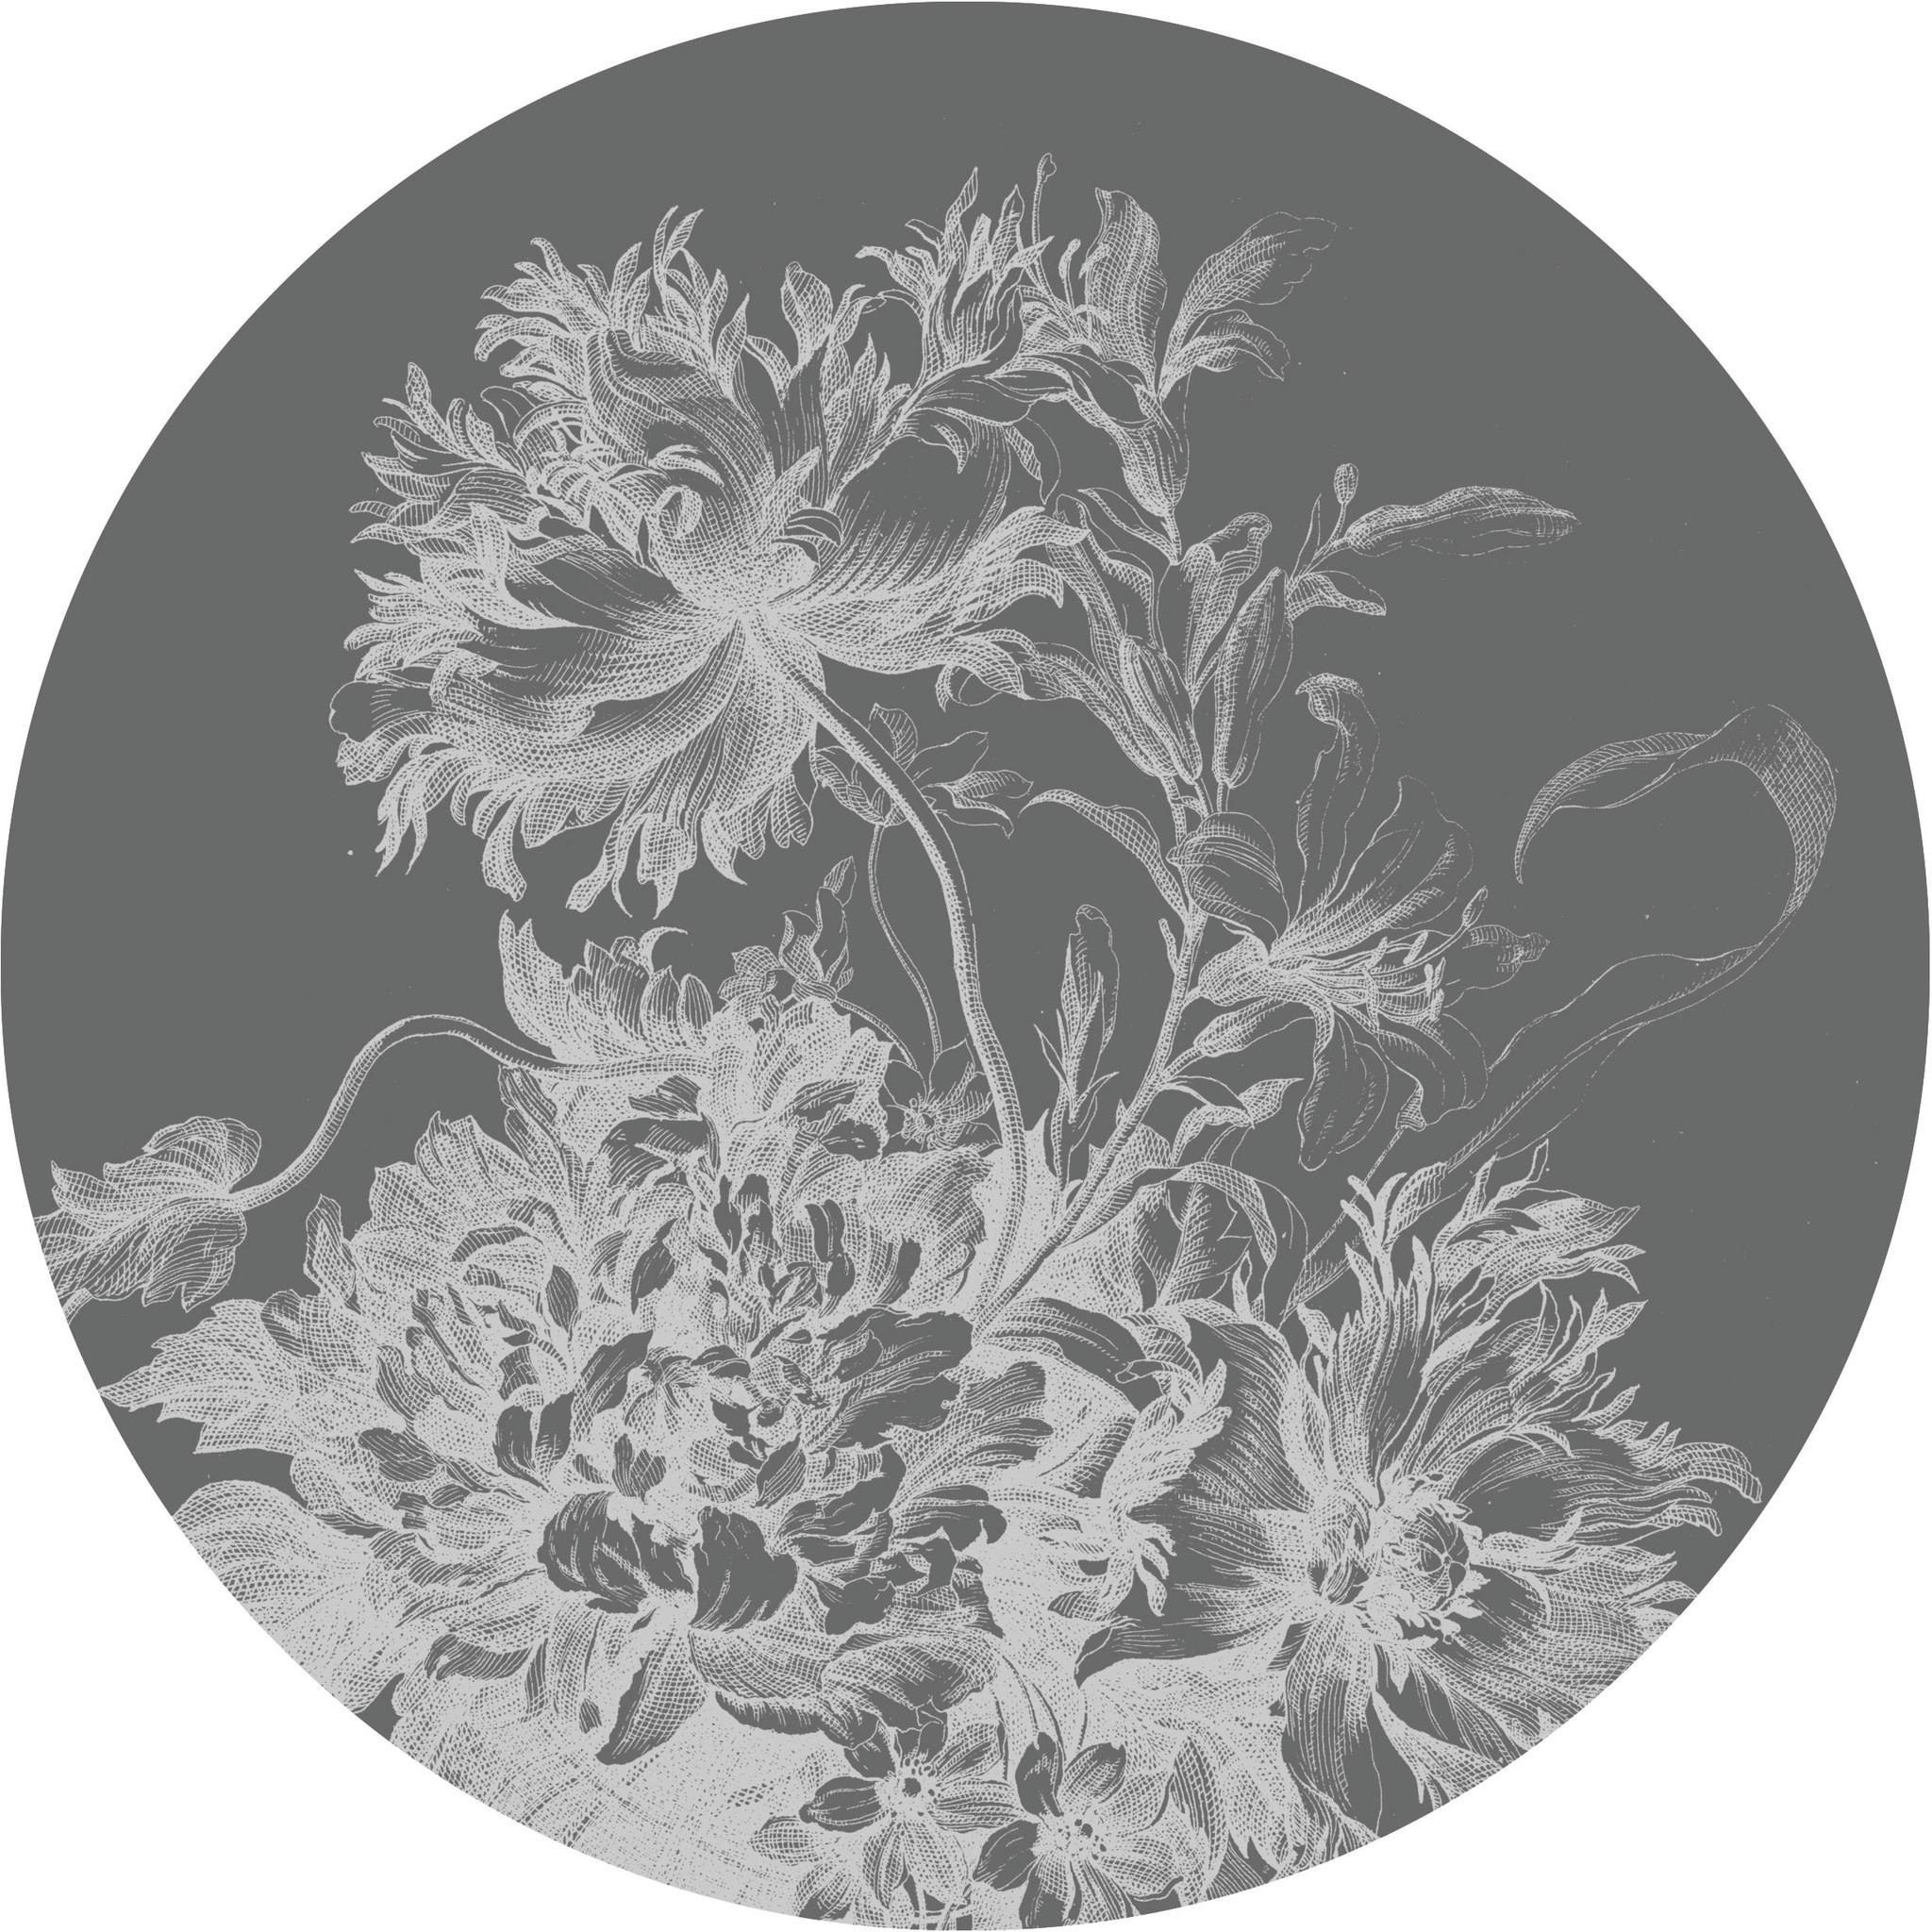 Behang Engraved Flowers XL Round Ø237.5cm-1